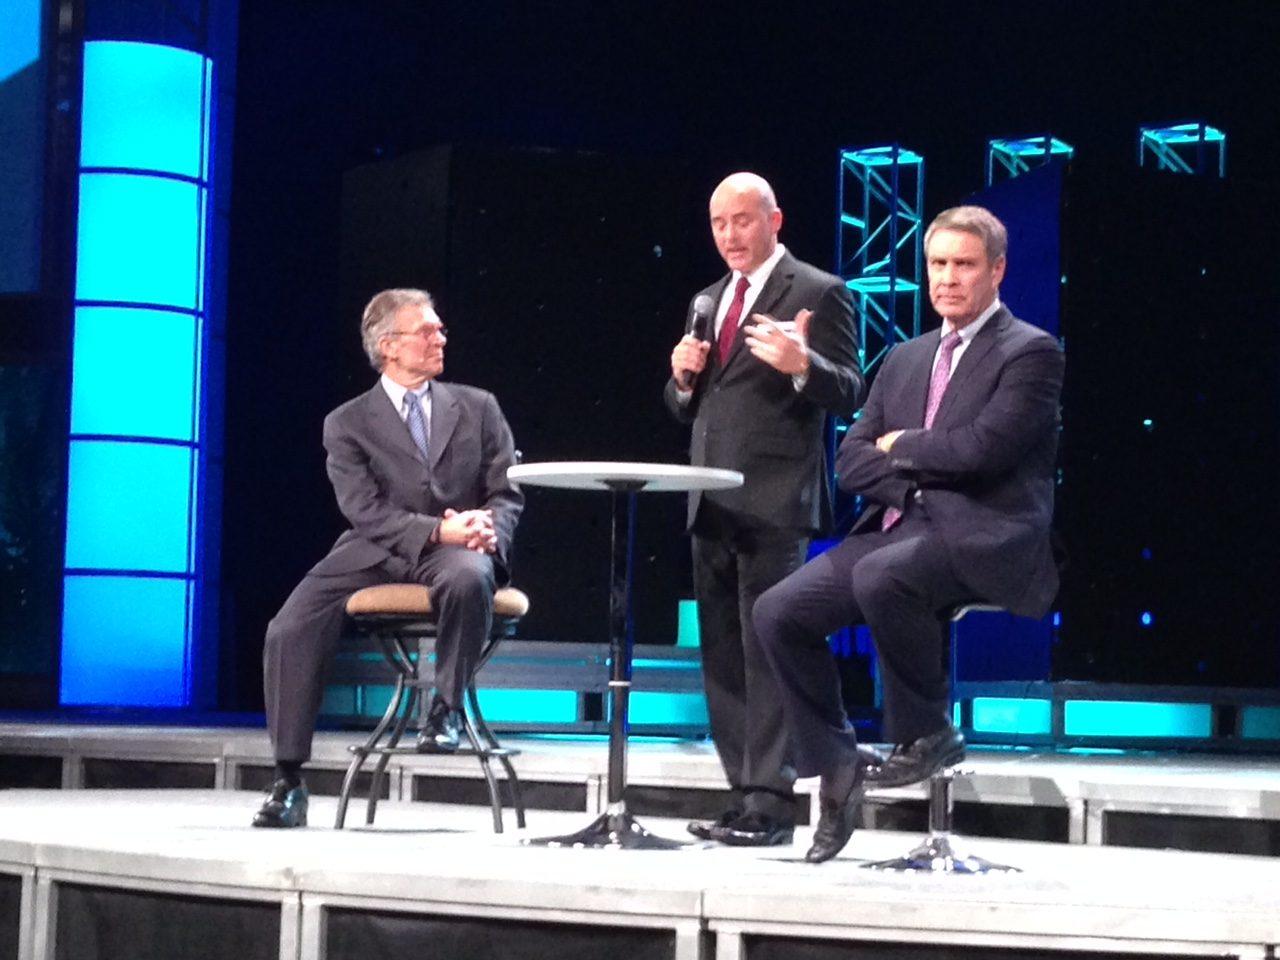 Former Senators Tom Daschle and Bill Frist debate health care leadership issues